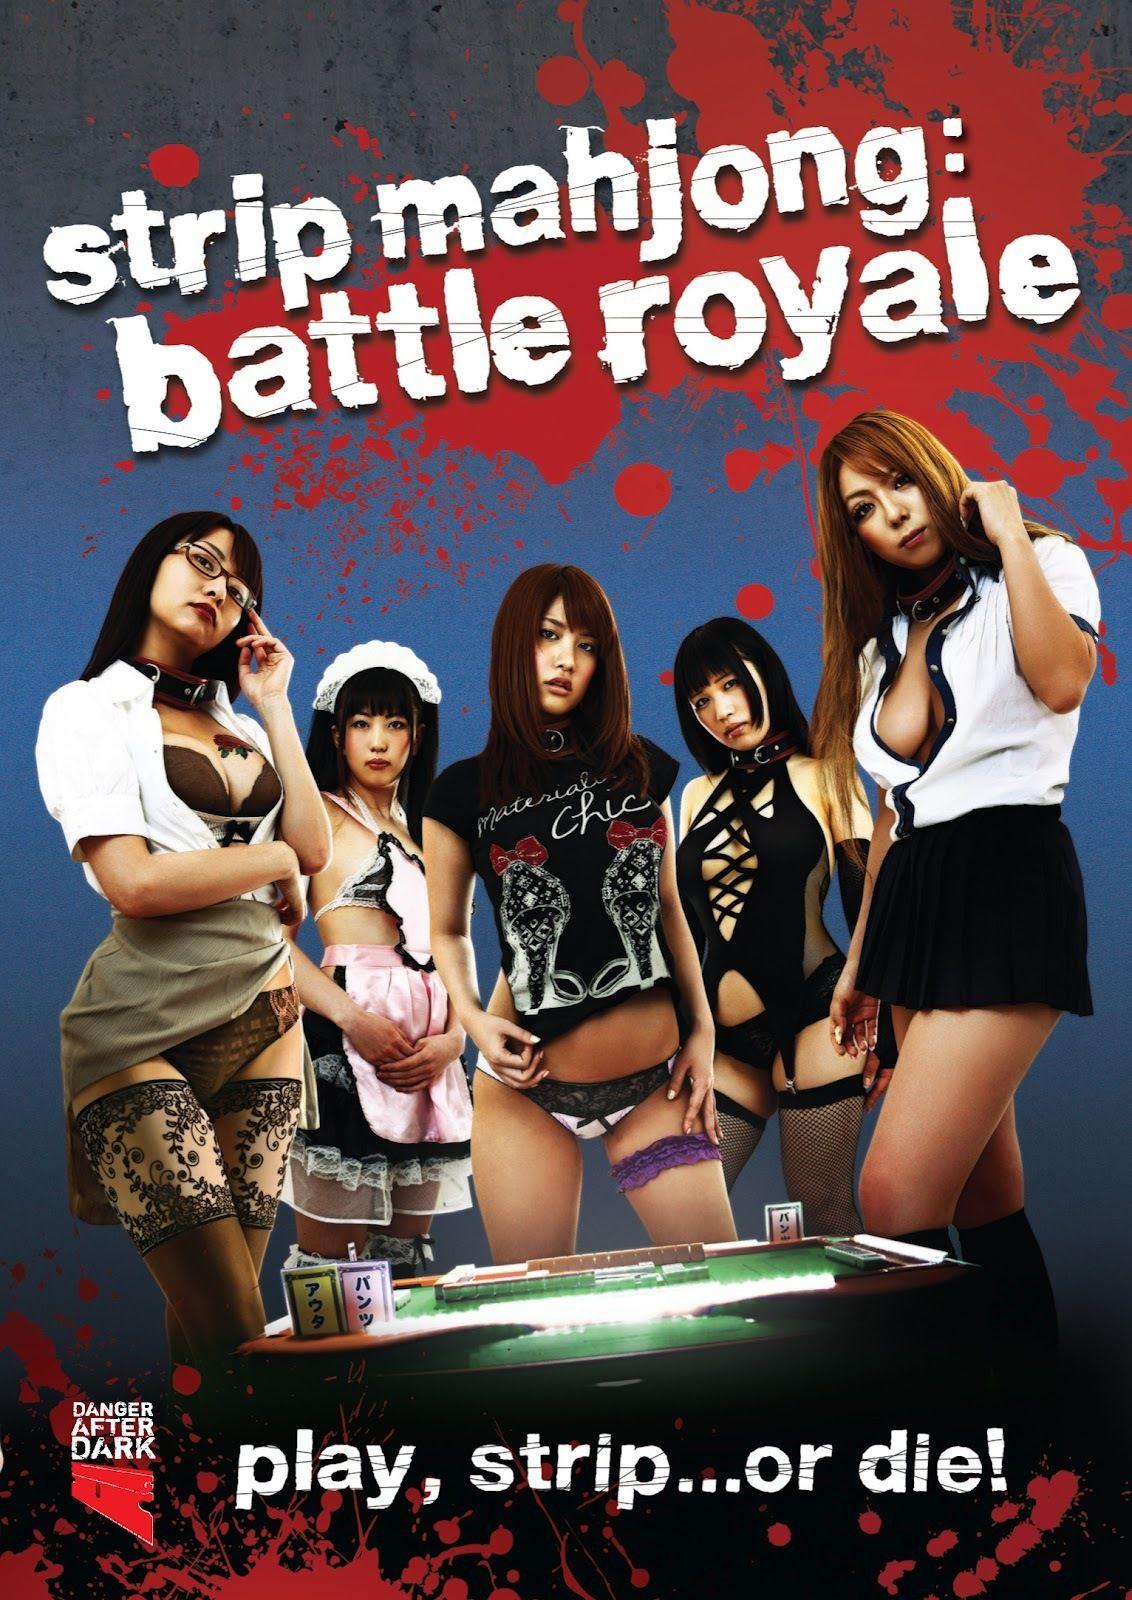 Strip Mahjong: Battle Royale - Film (2011)